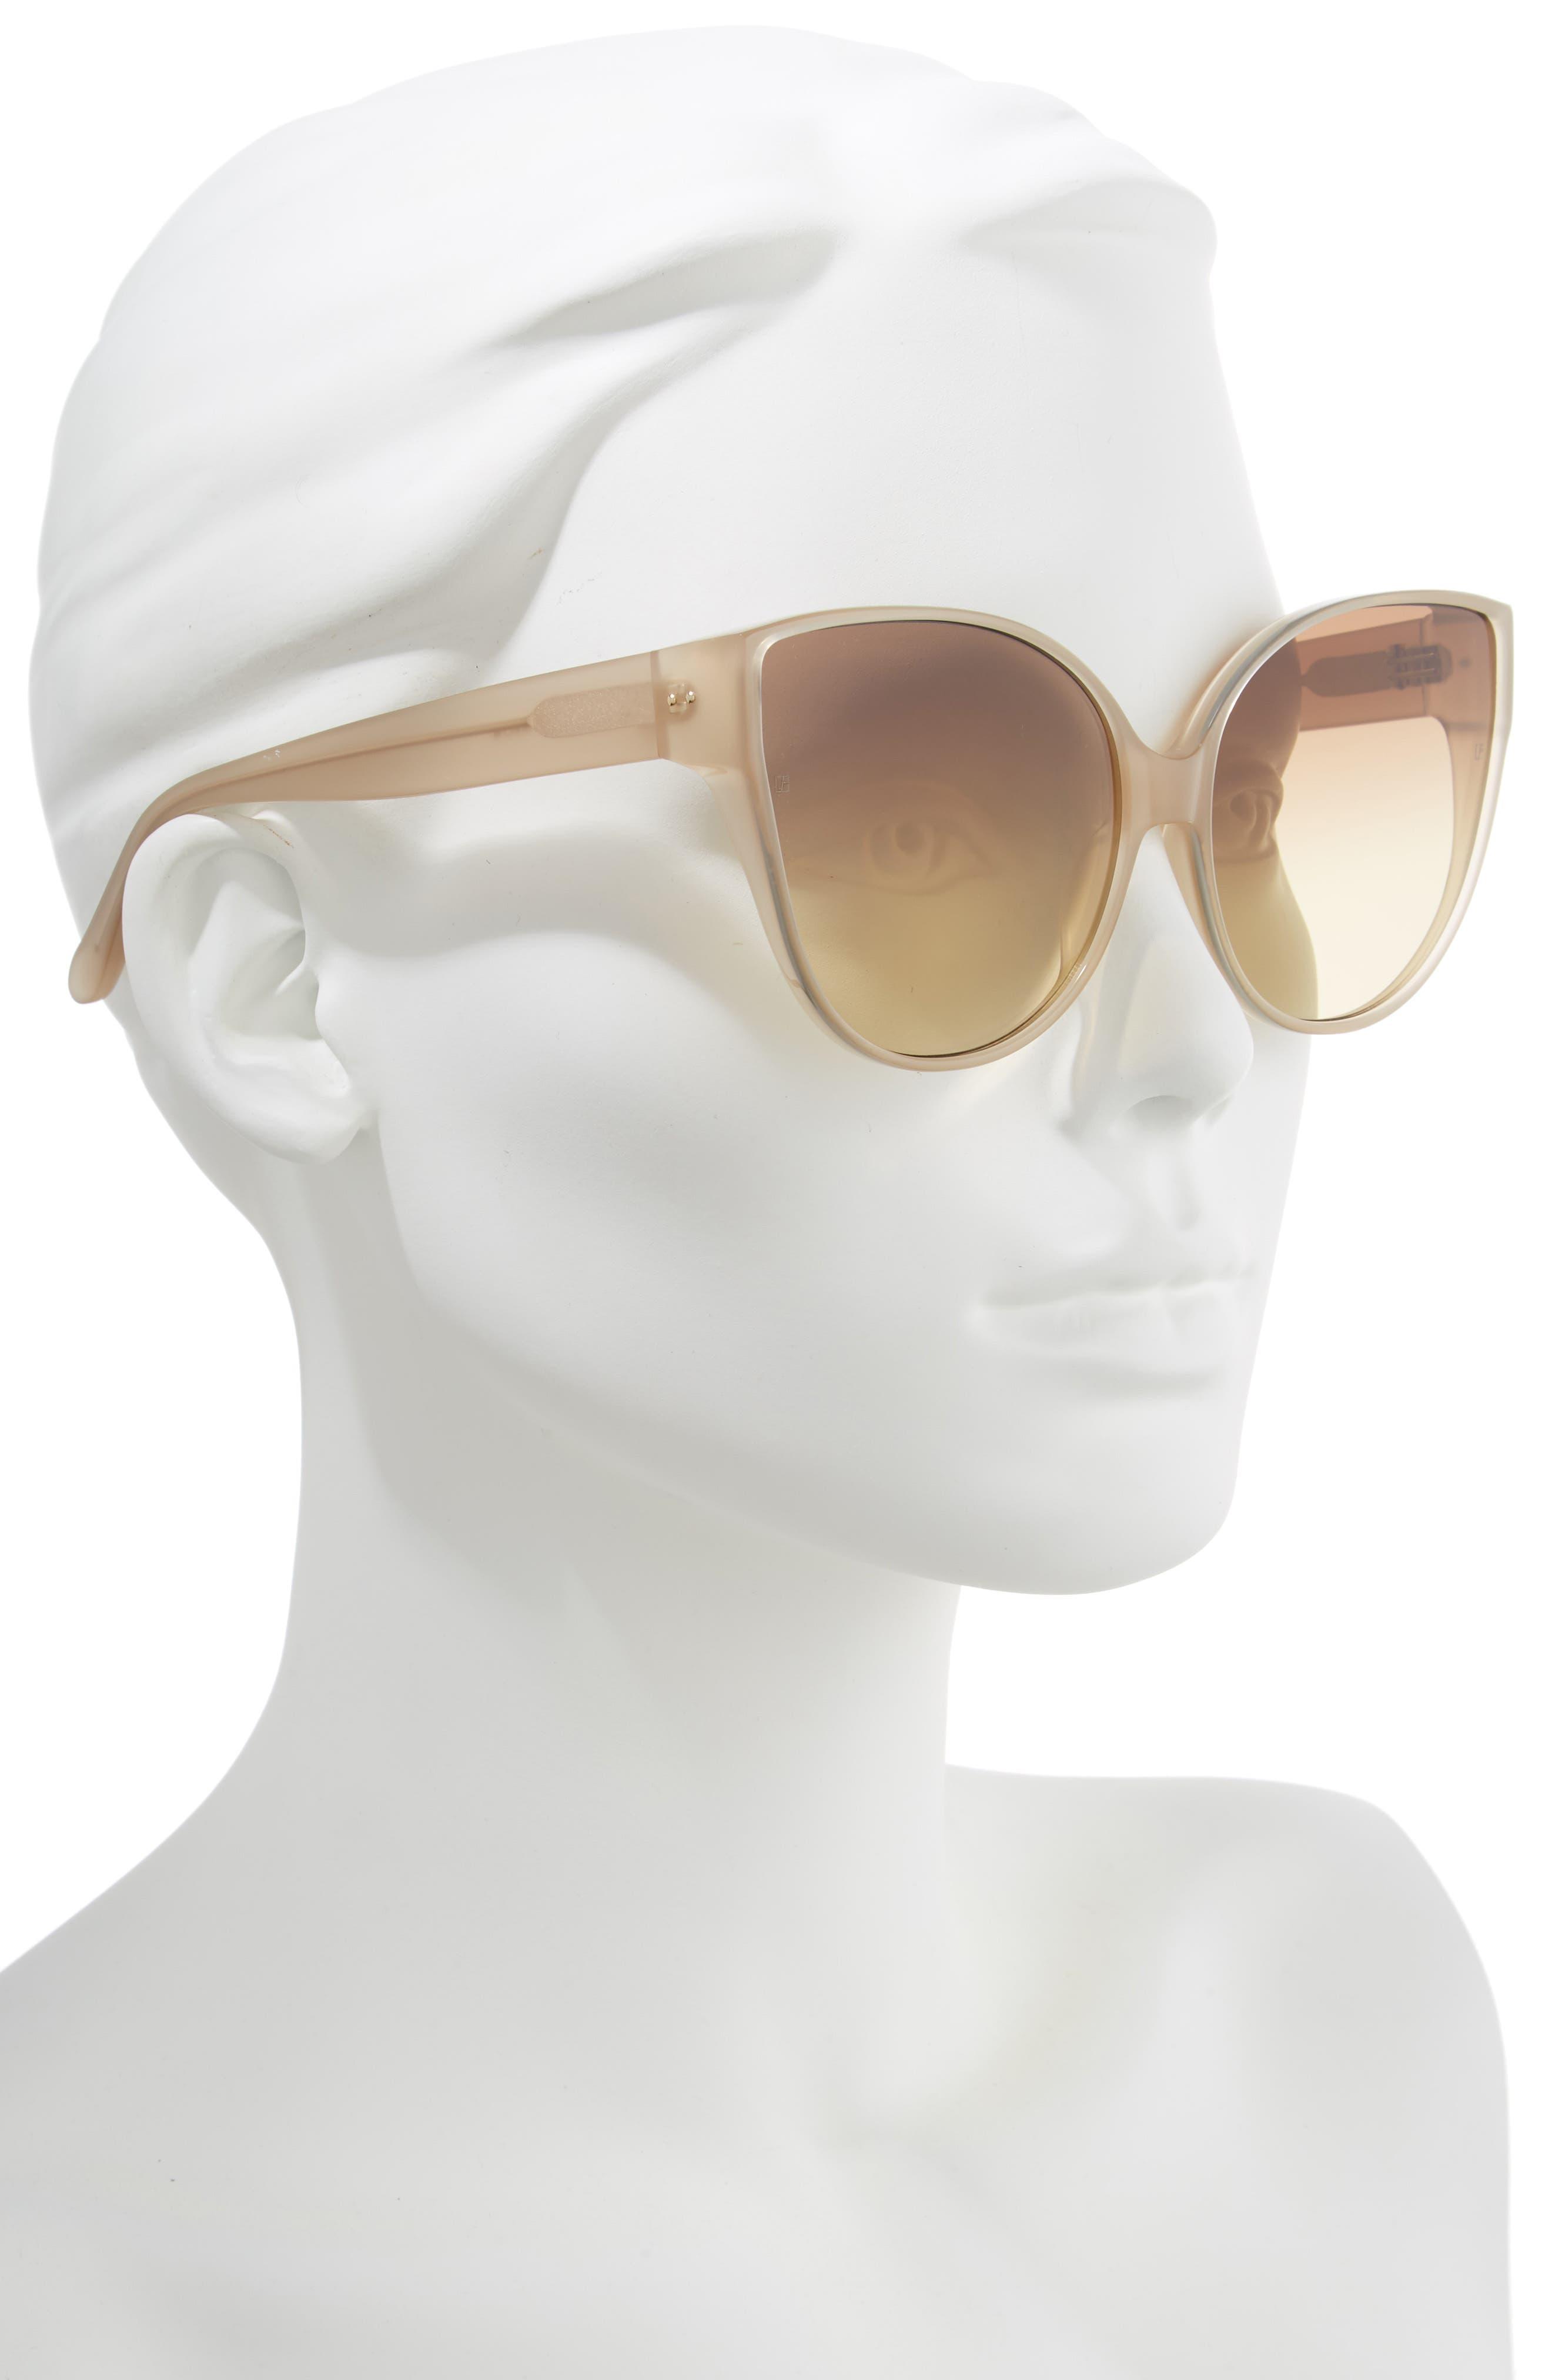 62mm Oversize Cat Eye Sunglasses,                             Alternate thumbnail 2, color,                             MILKY TOBACCO